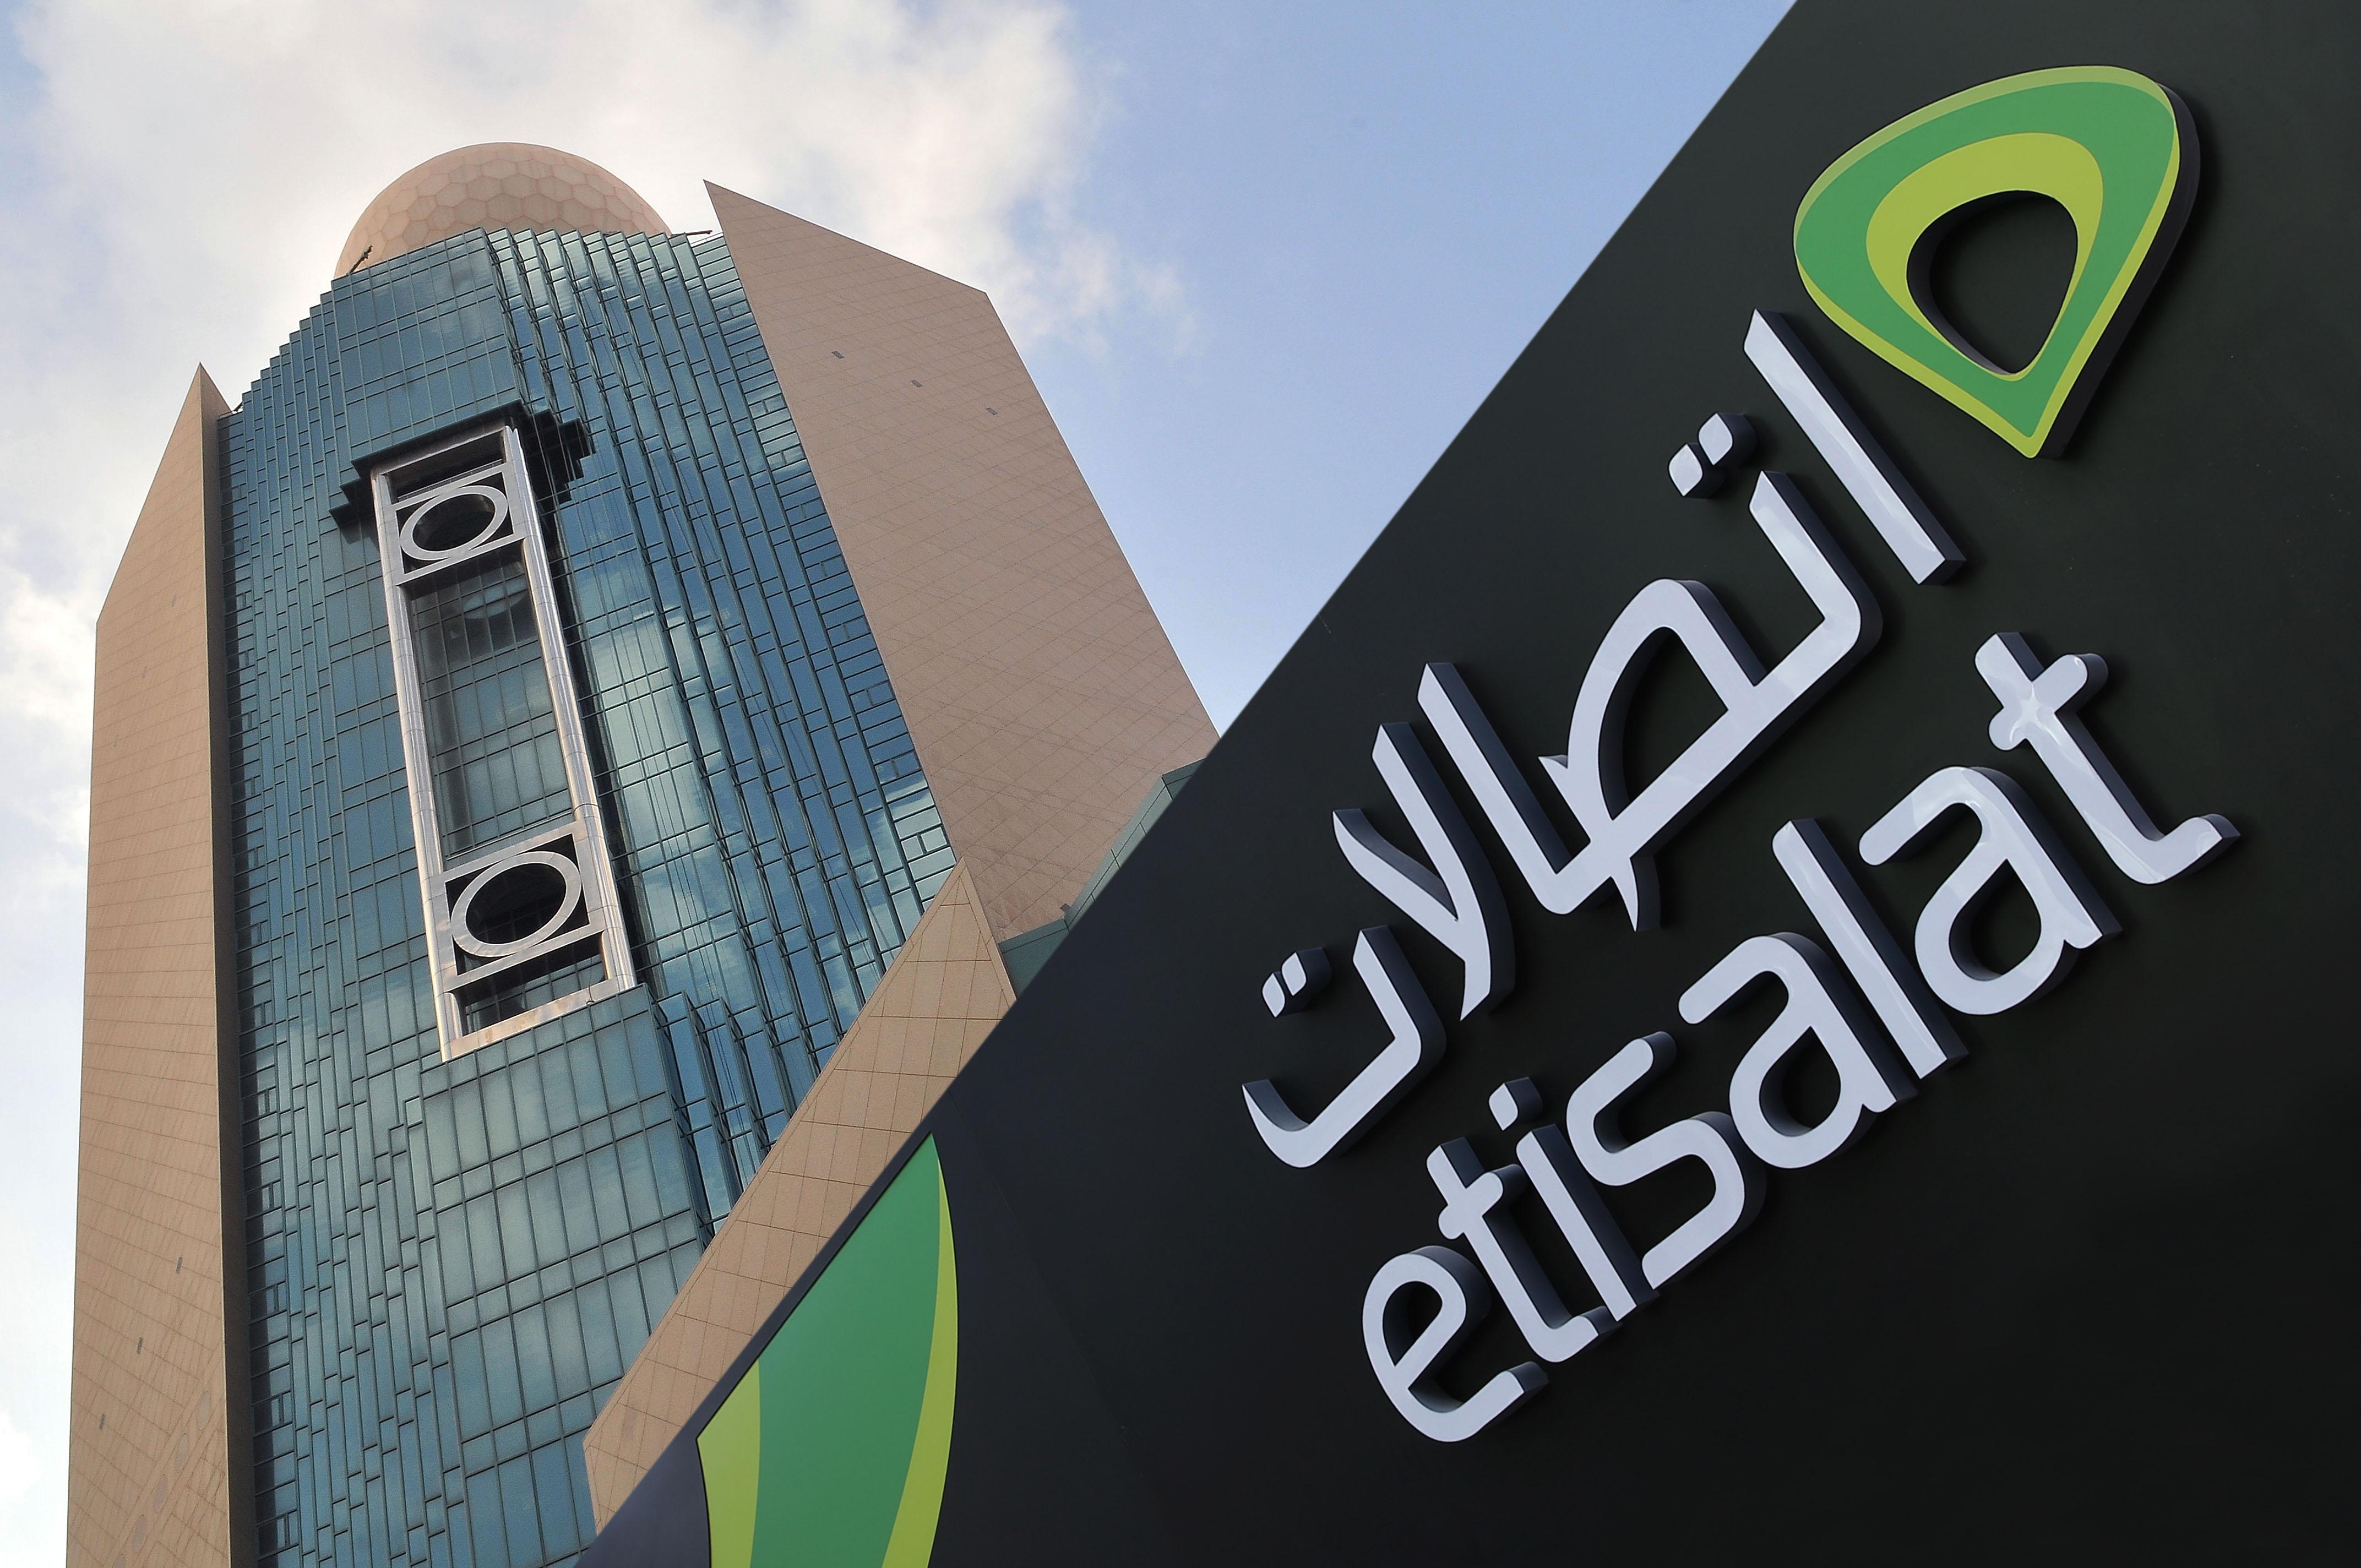 etisalat net profit grew to aed 21 billion